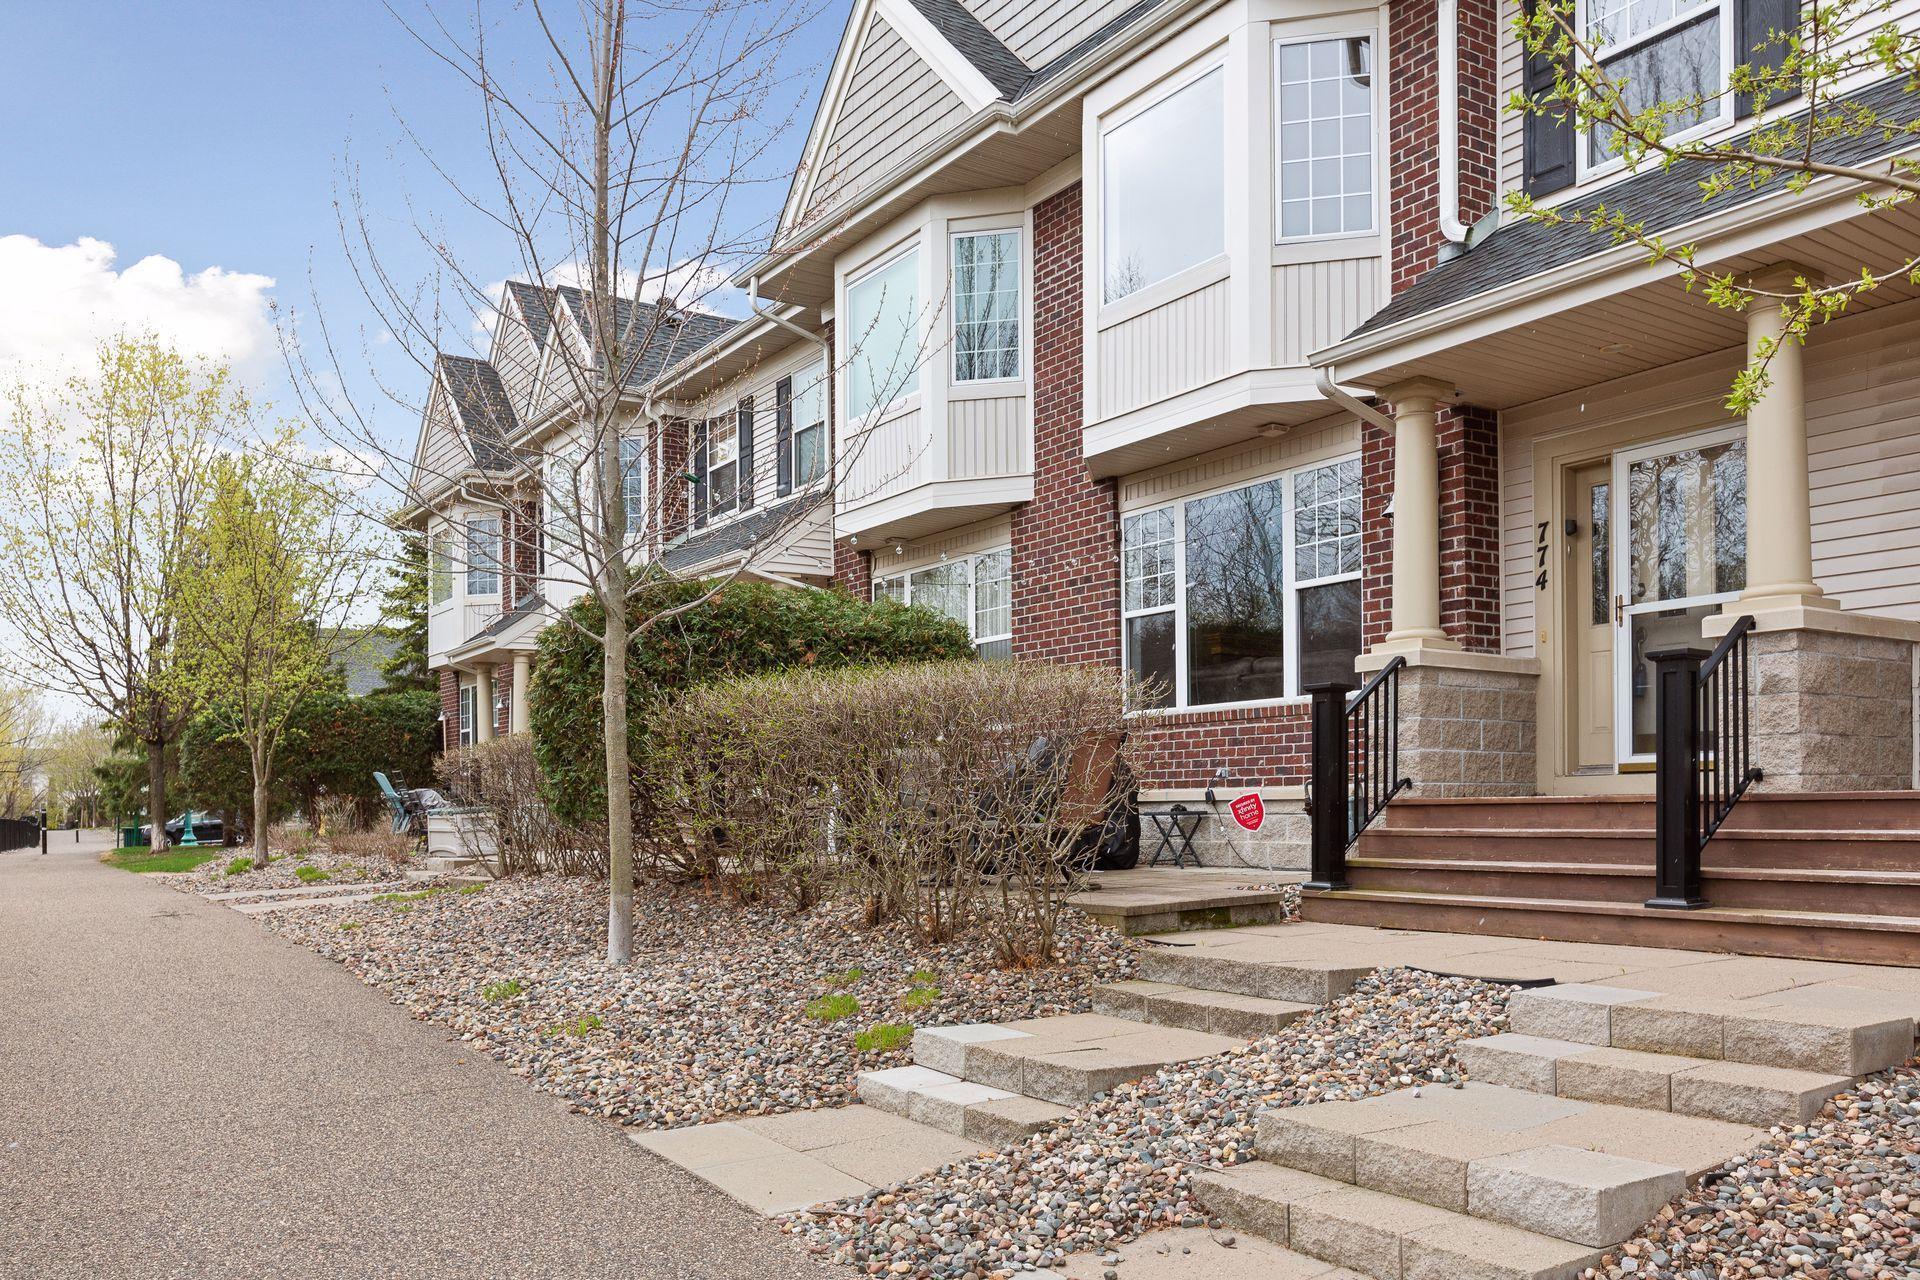 774 Wisconsin Avenue N, Golden Valley MN 55427 - Photo 1